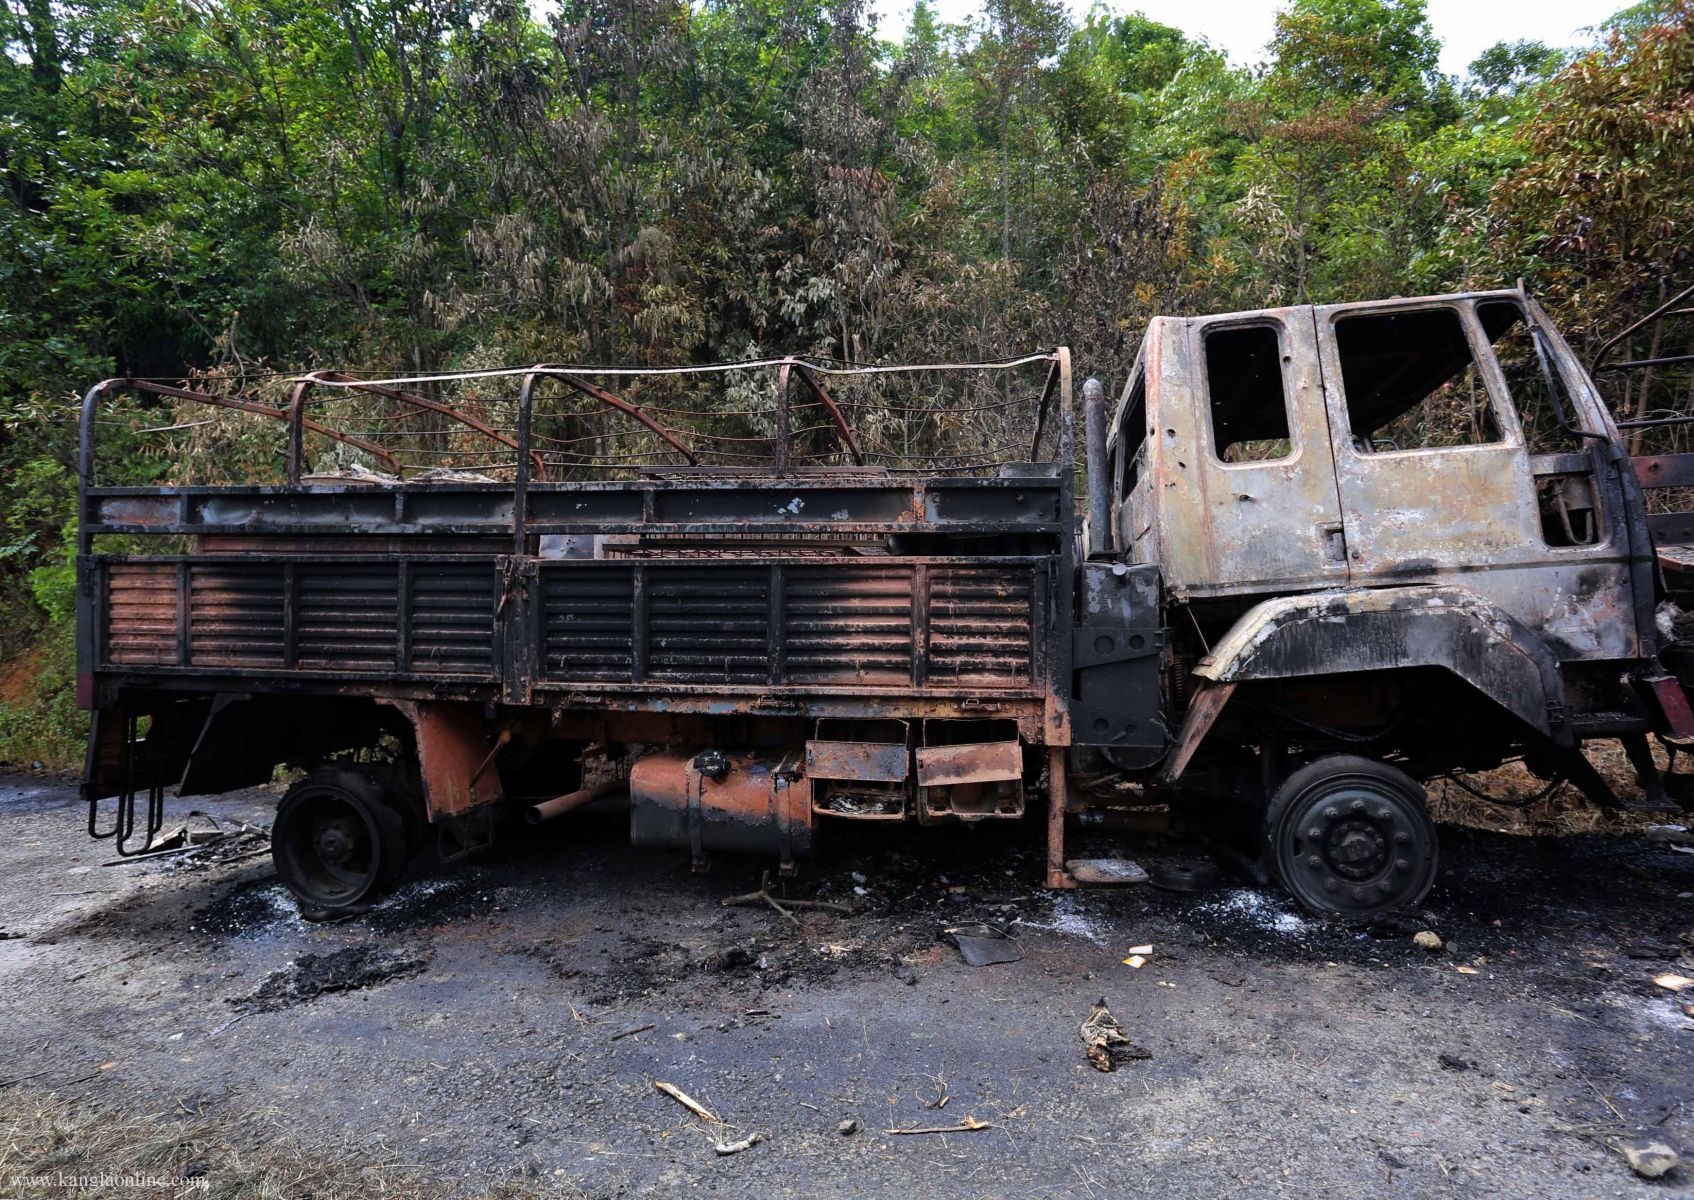 6th Dogra Regiment's truck ambushed by militants at Paorolon, Chandel District, Manipur.  Photo by Deepak Shijagurumayum.